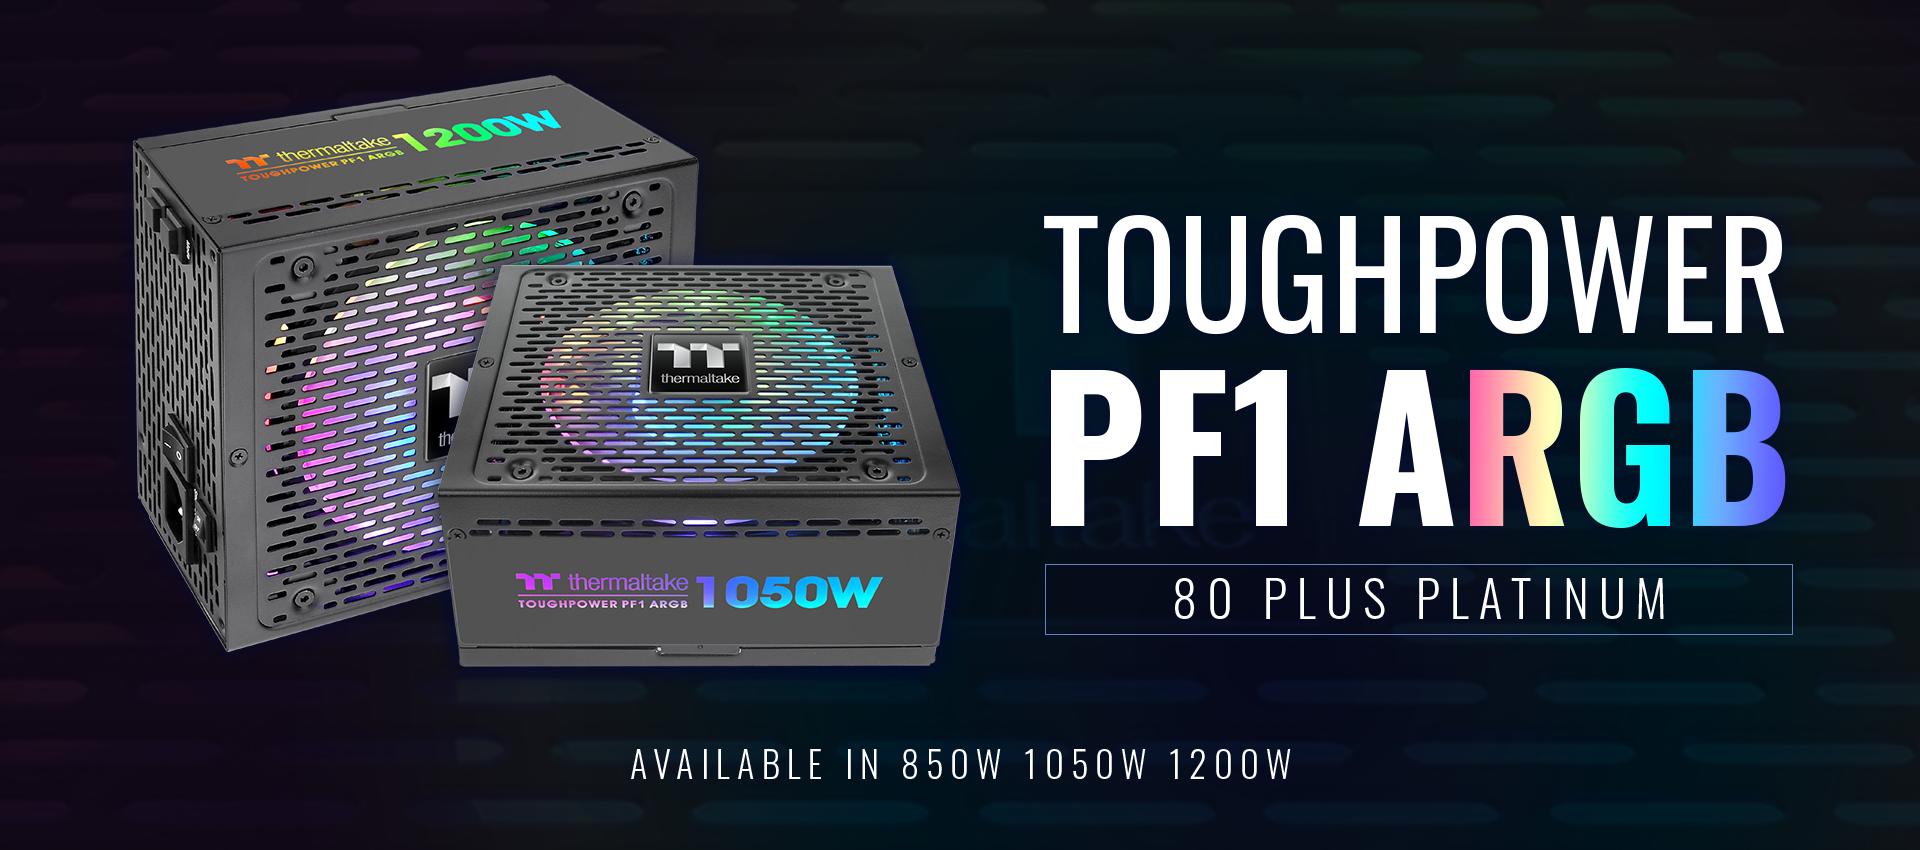 Toughpower PF1 ARGB